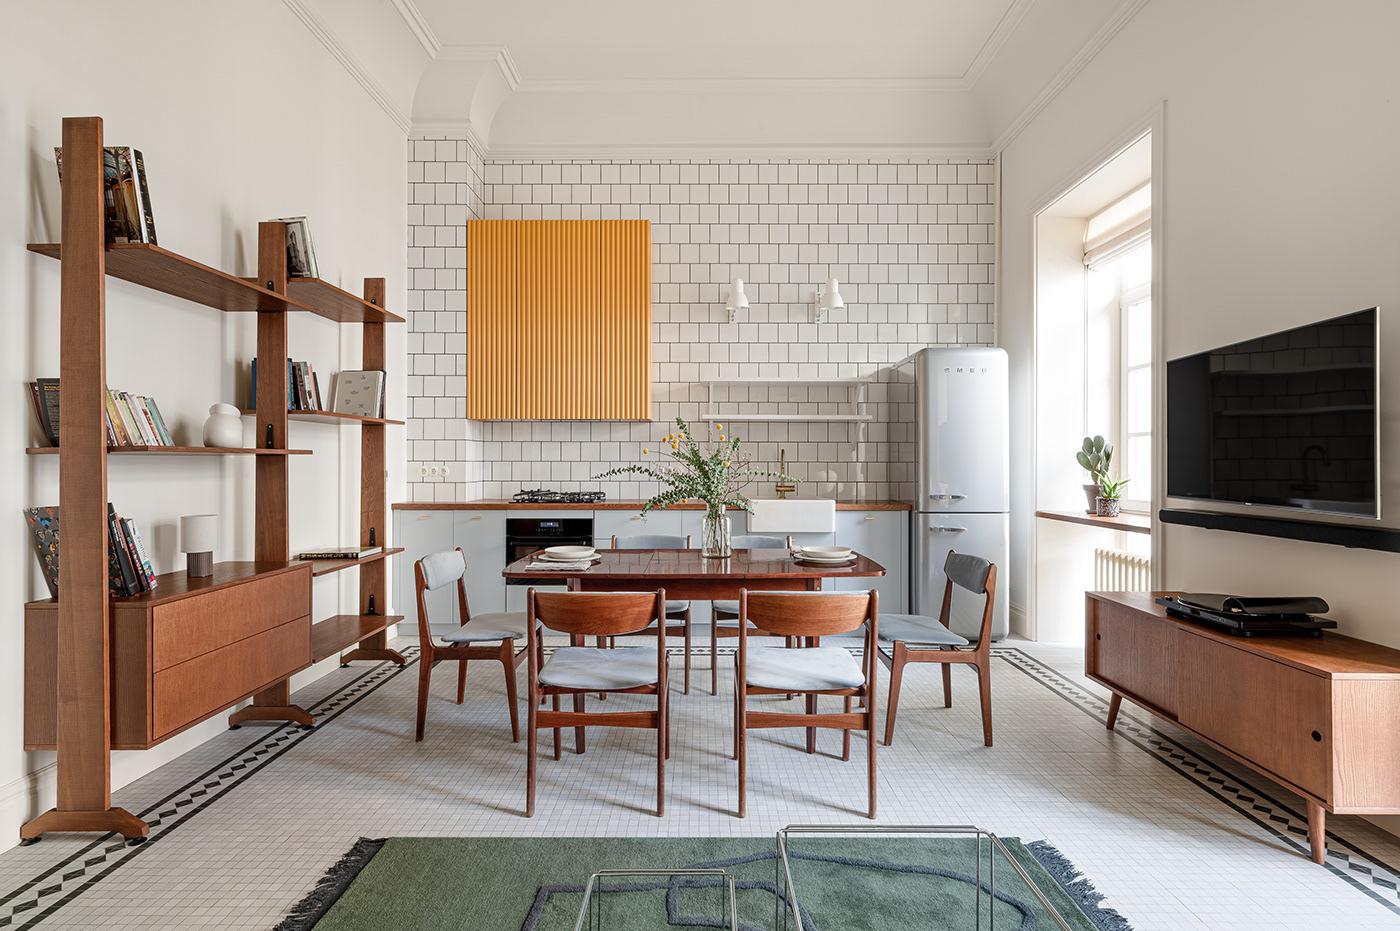 cozy design Interior interiordesign Kyiv light soft Style ukraine vintage